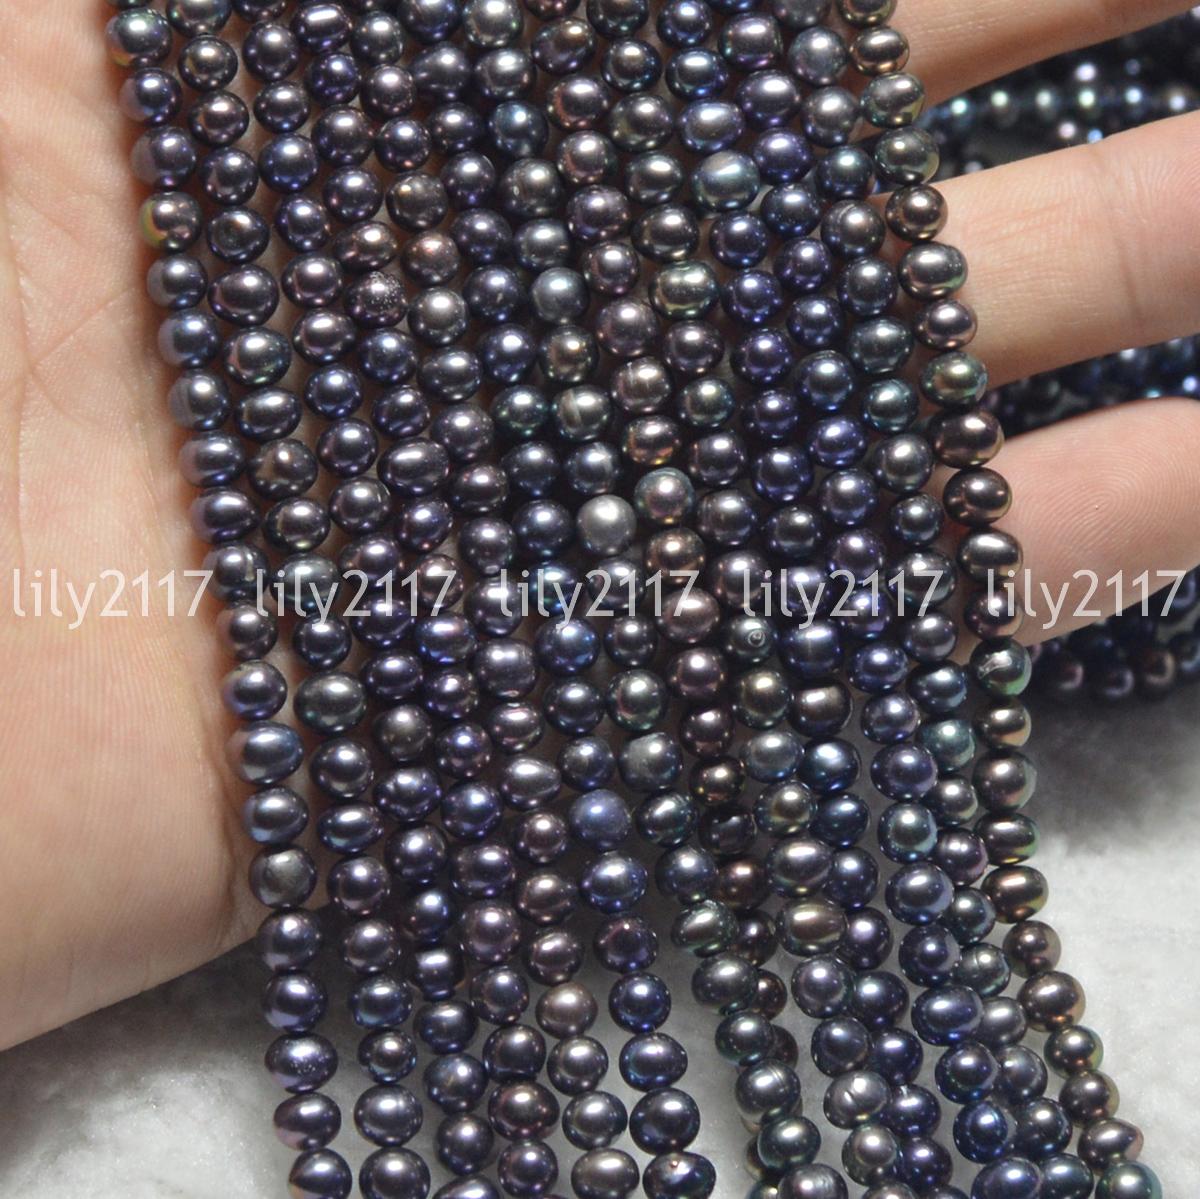 Natural AAA Black Tahitian Pearl Bead Loose 15inch